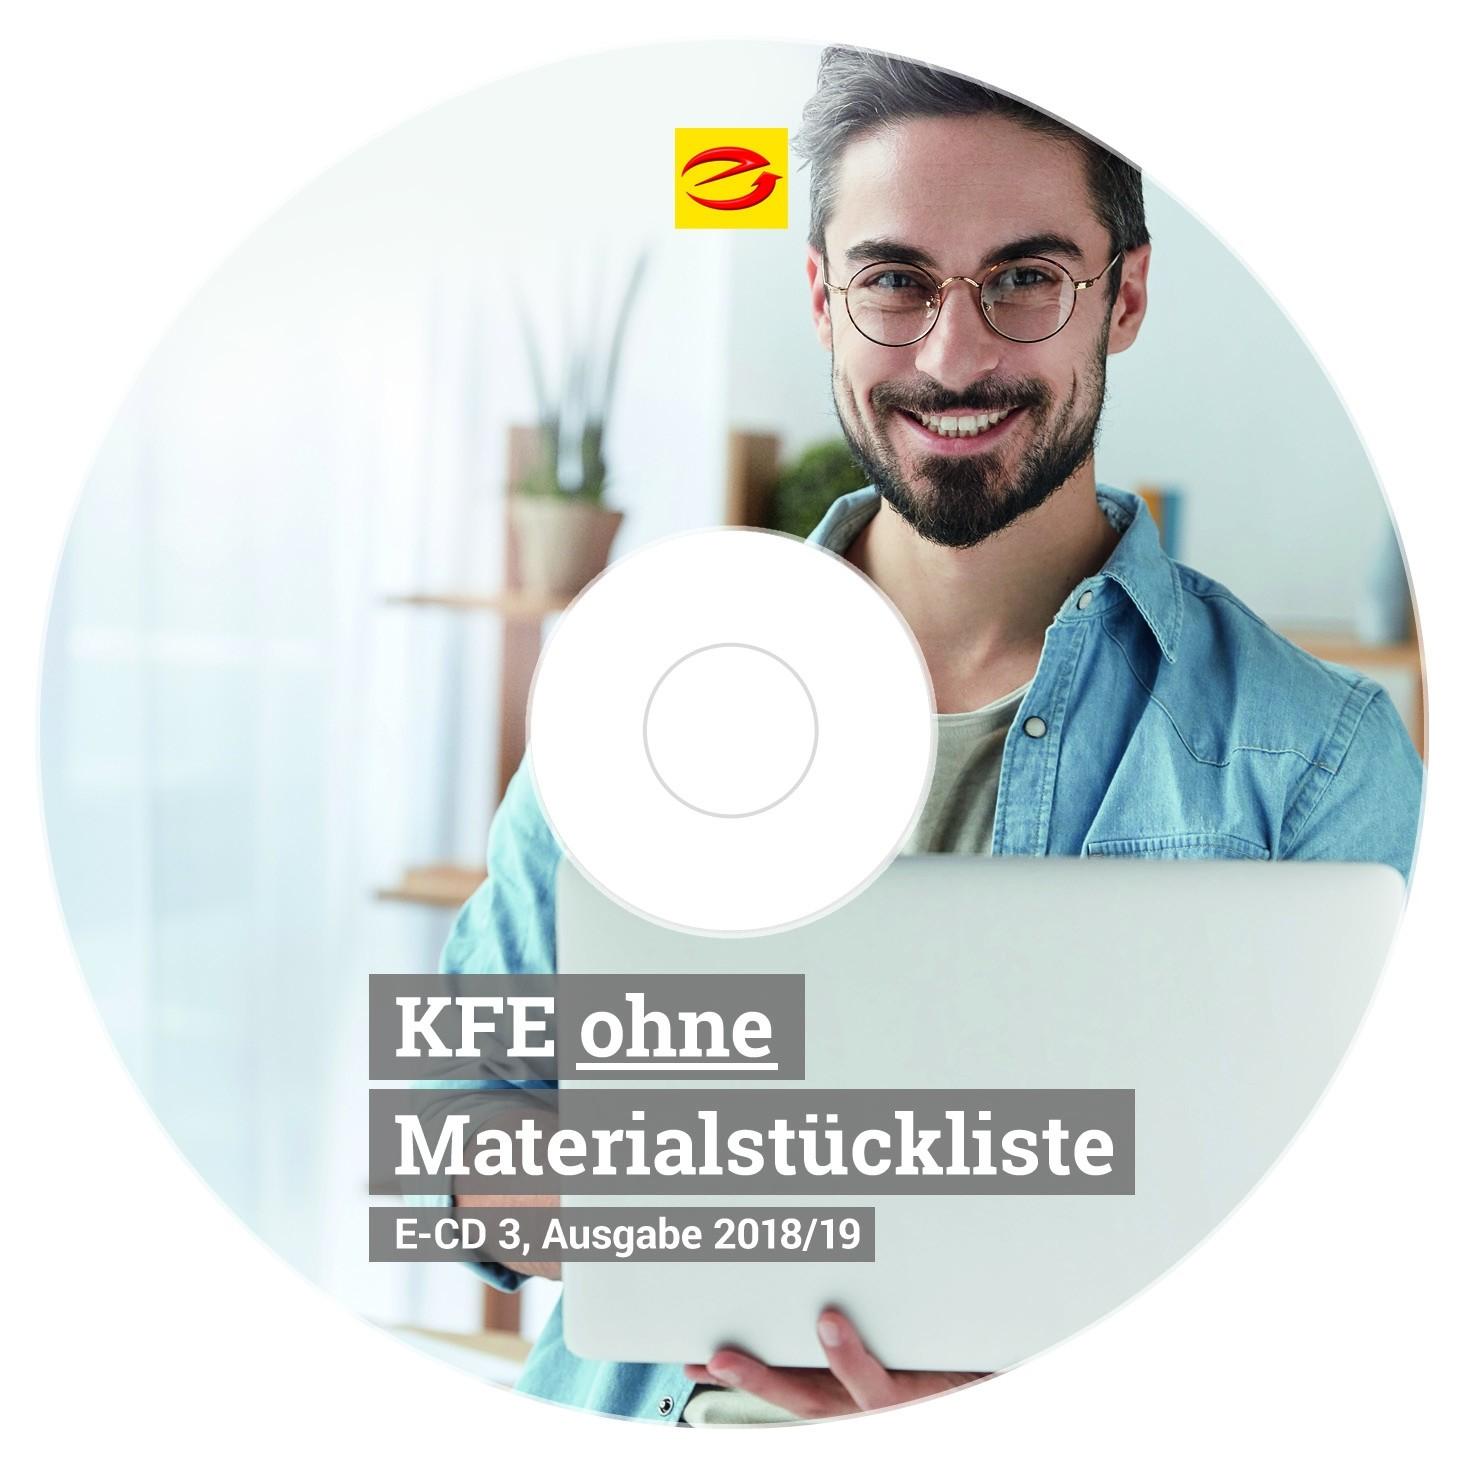 E-CD 3 Kalkulationshilfe Standardversion 2018 / 19